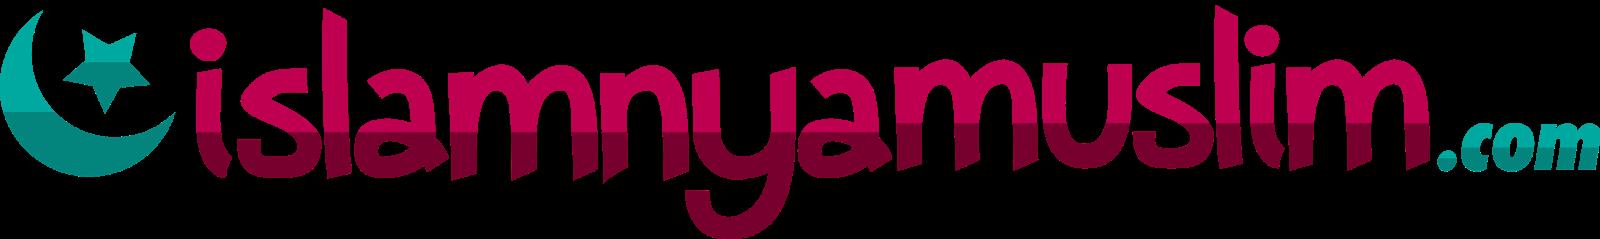 islamnyamuslim.com